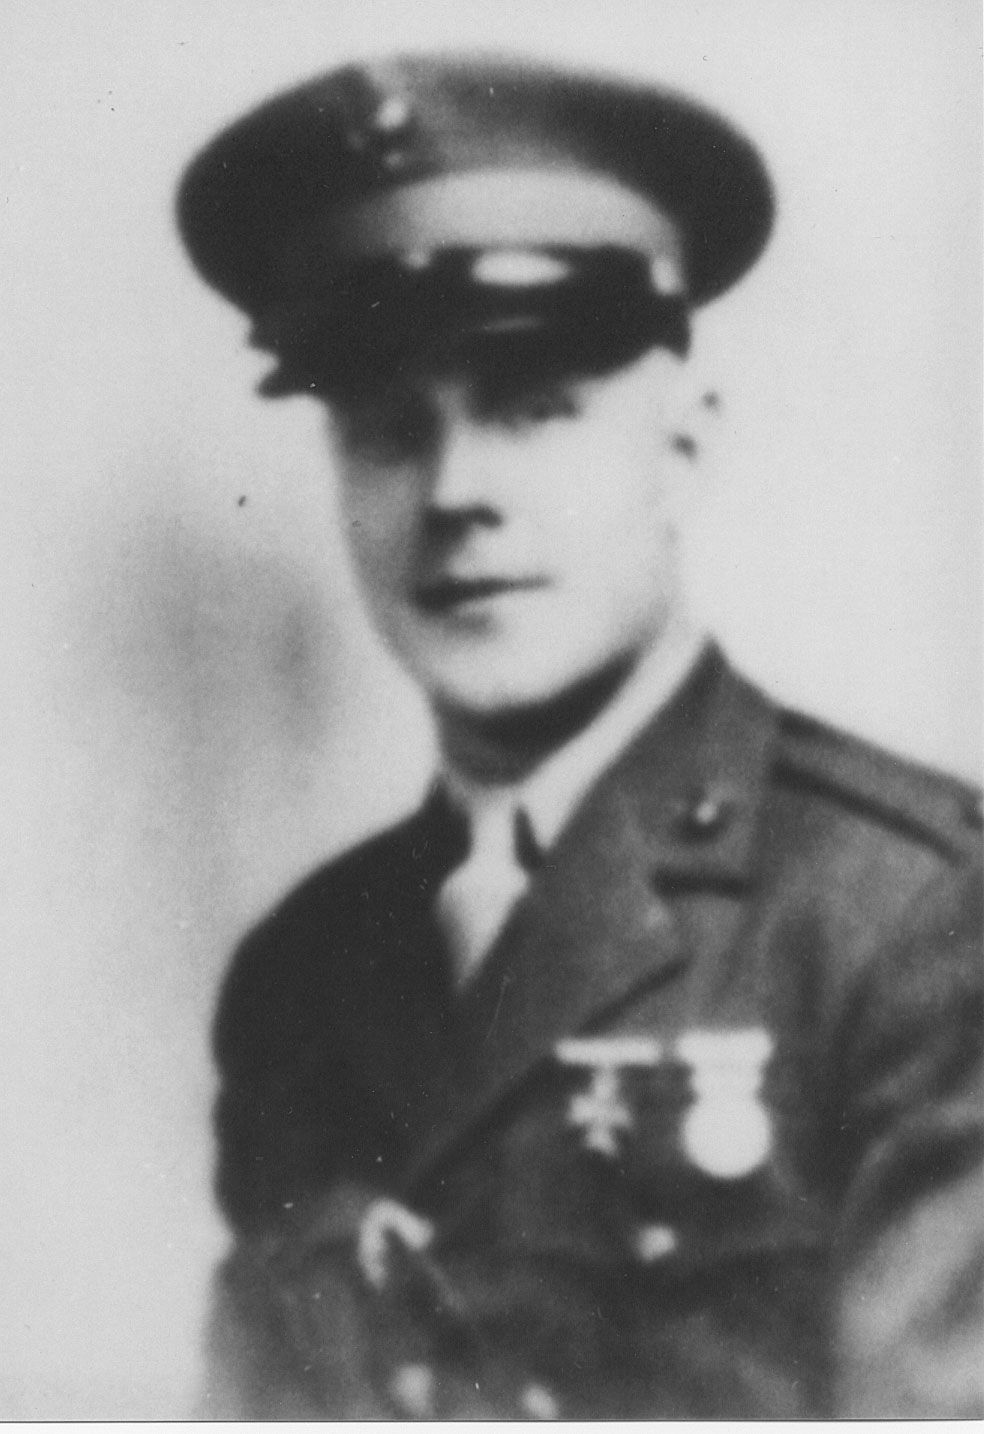 Lieutenant Col. Thomas Edward Fox